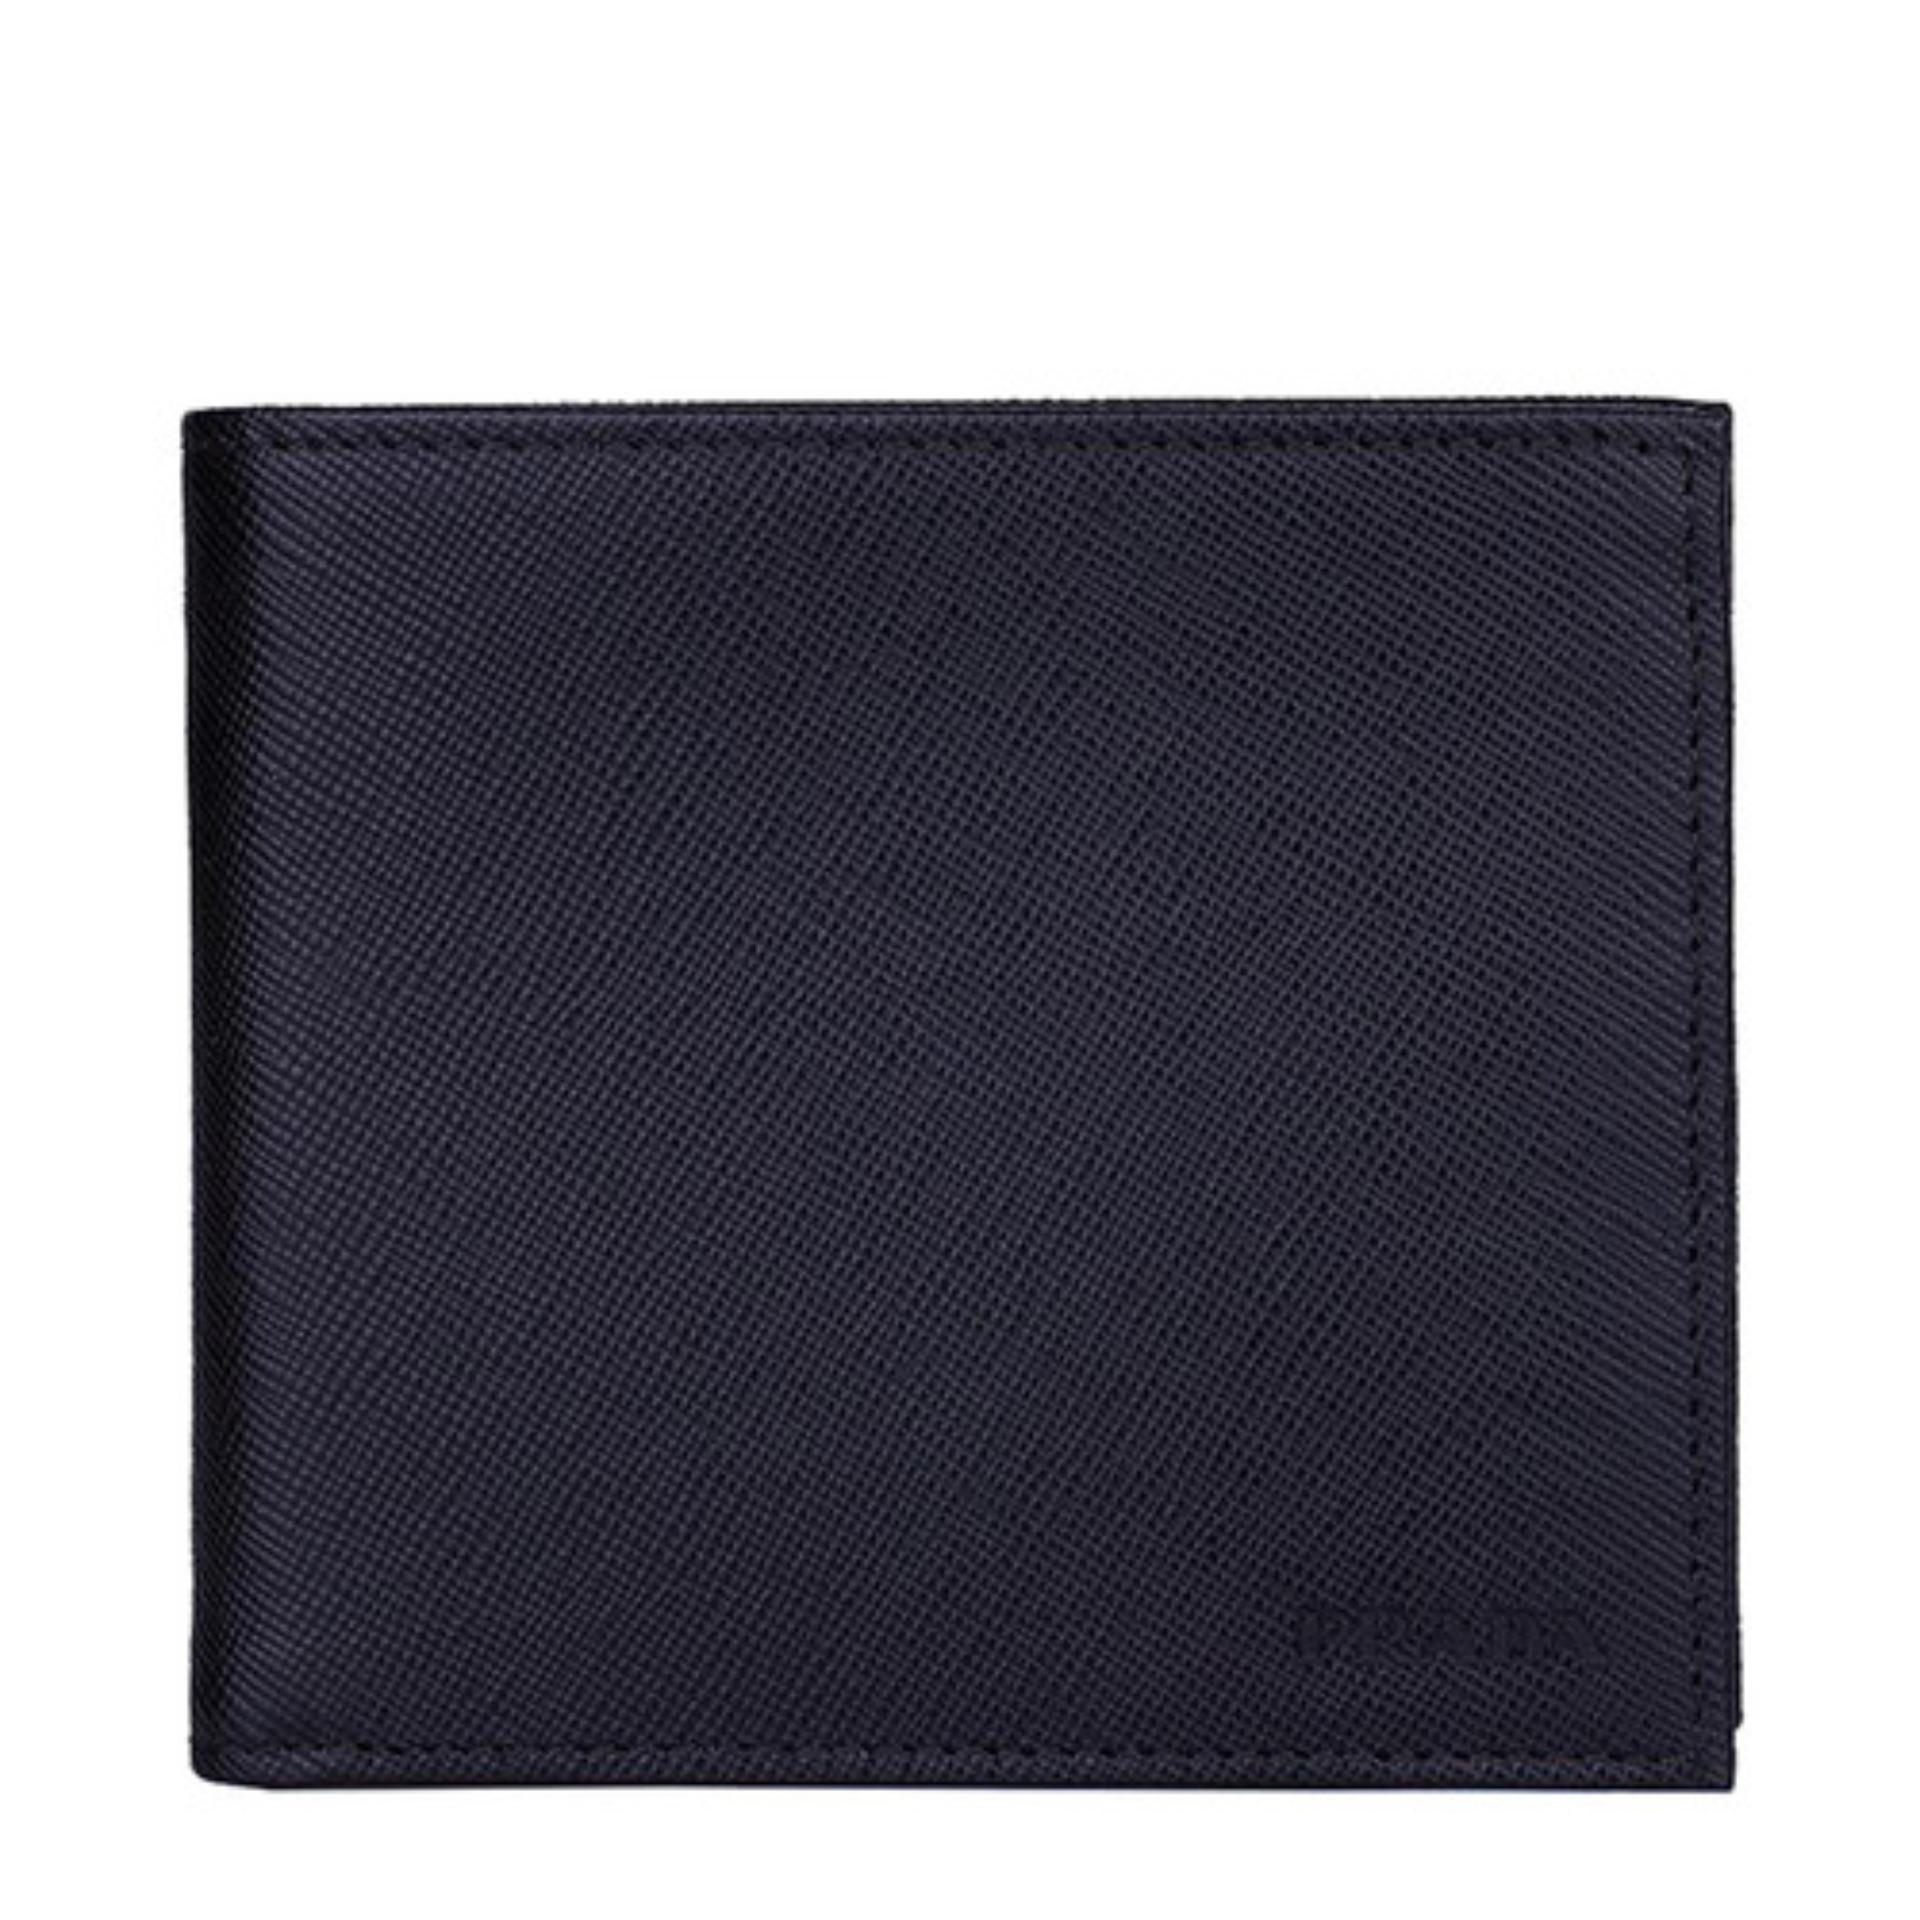 00d40e5417ca11 Latest Prada Men Fashion Wallets Products | Enjoy Huge Discounts ...